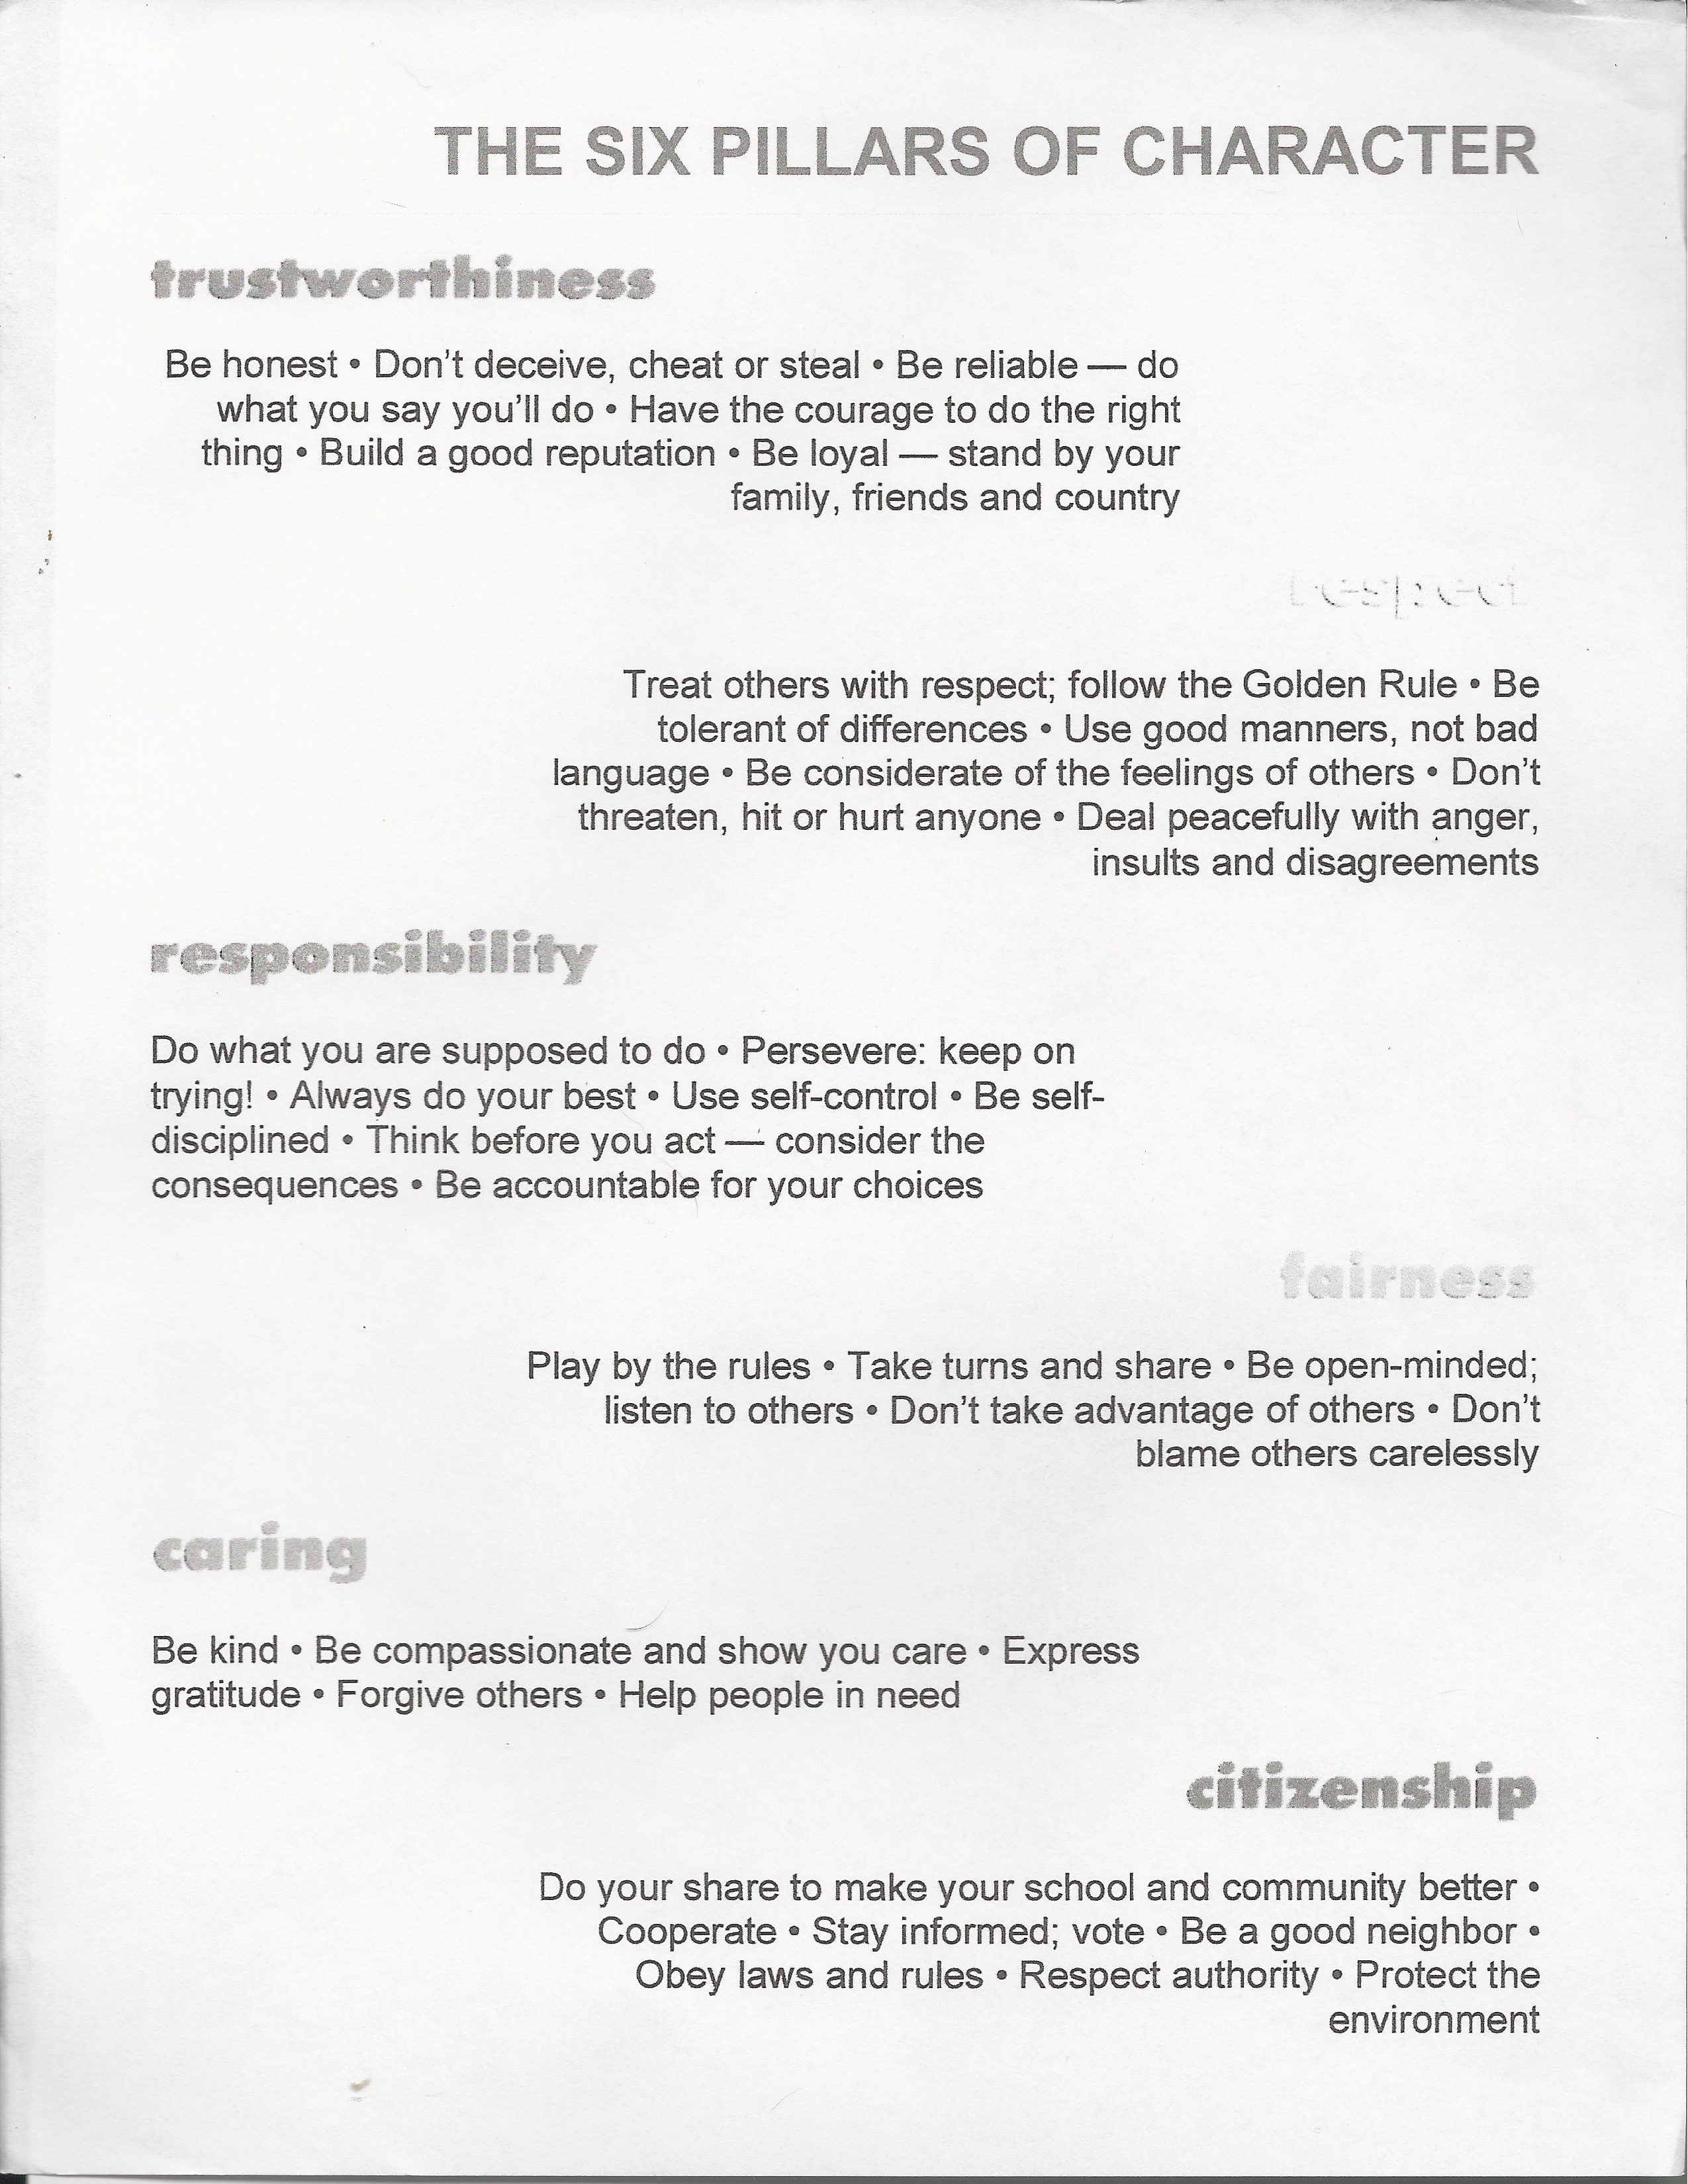 004 Essay Example Trust Pillars Of Character Fantastic Topics In Hindi Essays Free Full